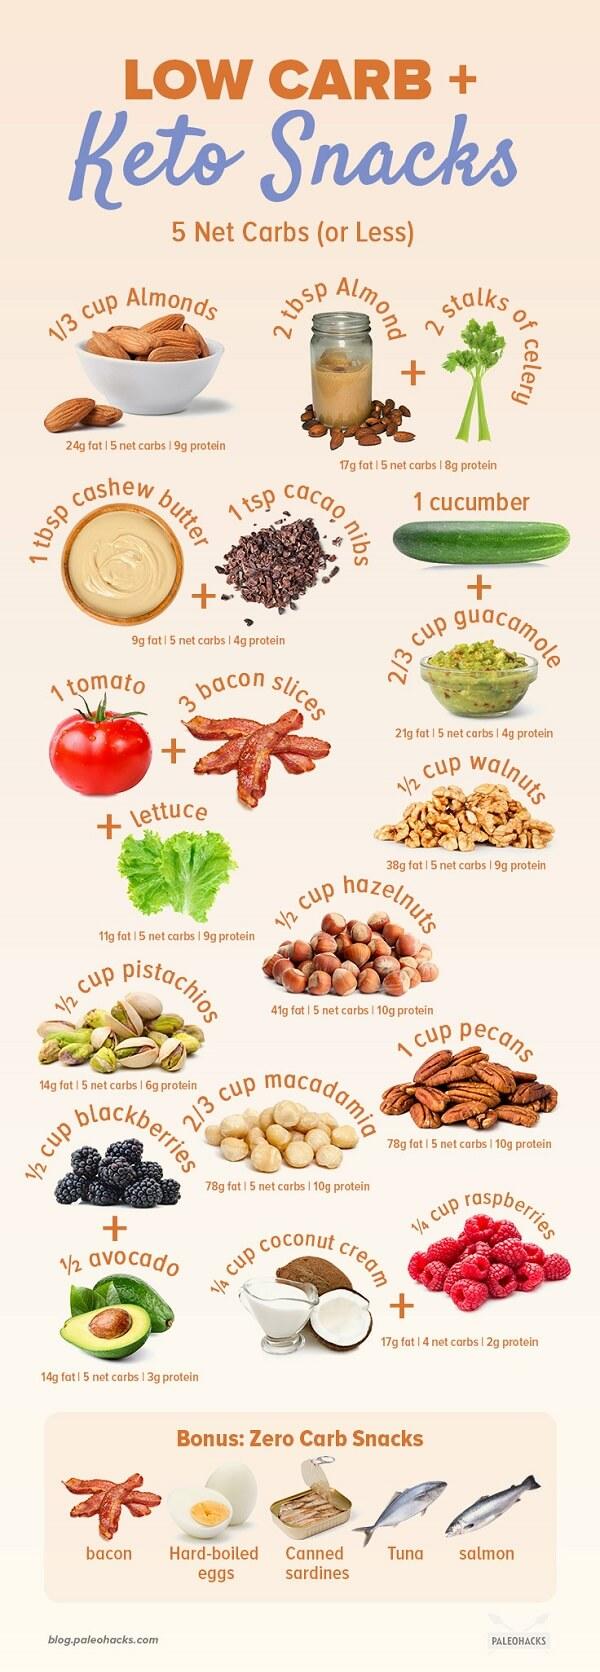 Easy Keto & Low-carb snacks